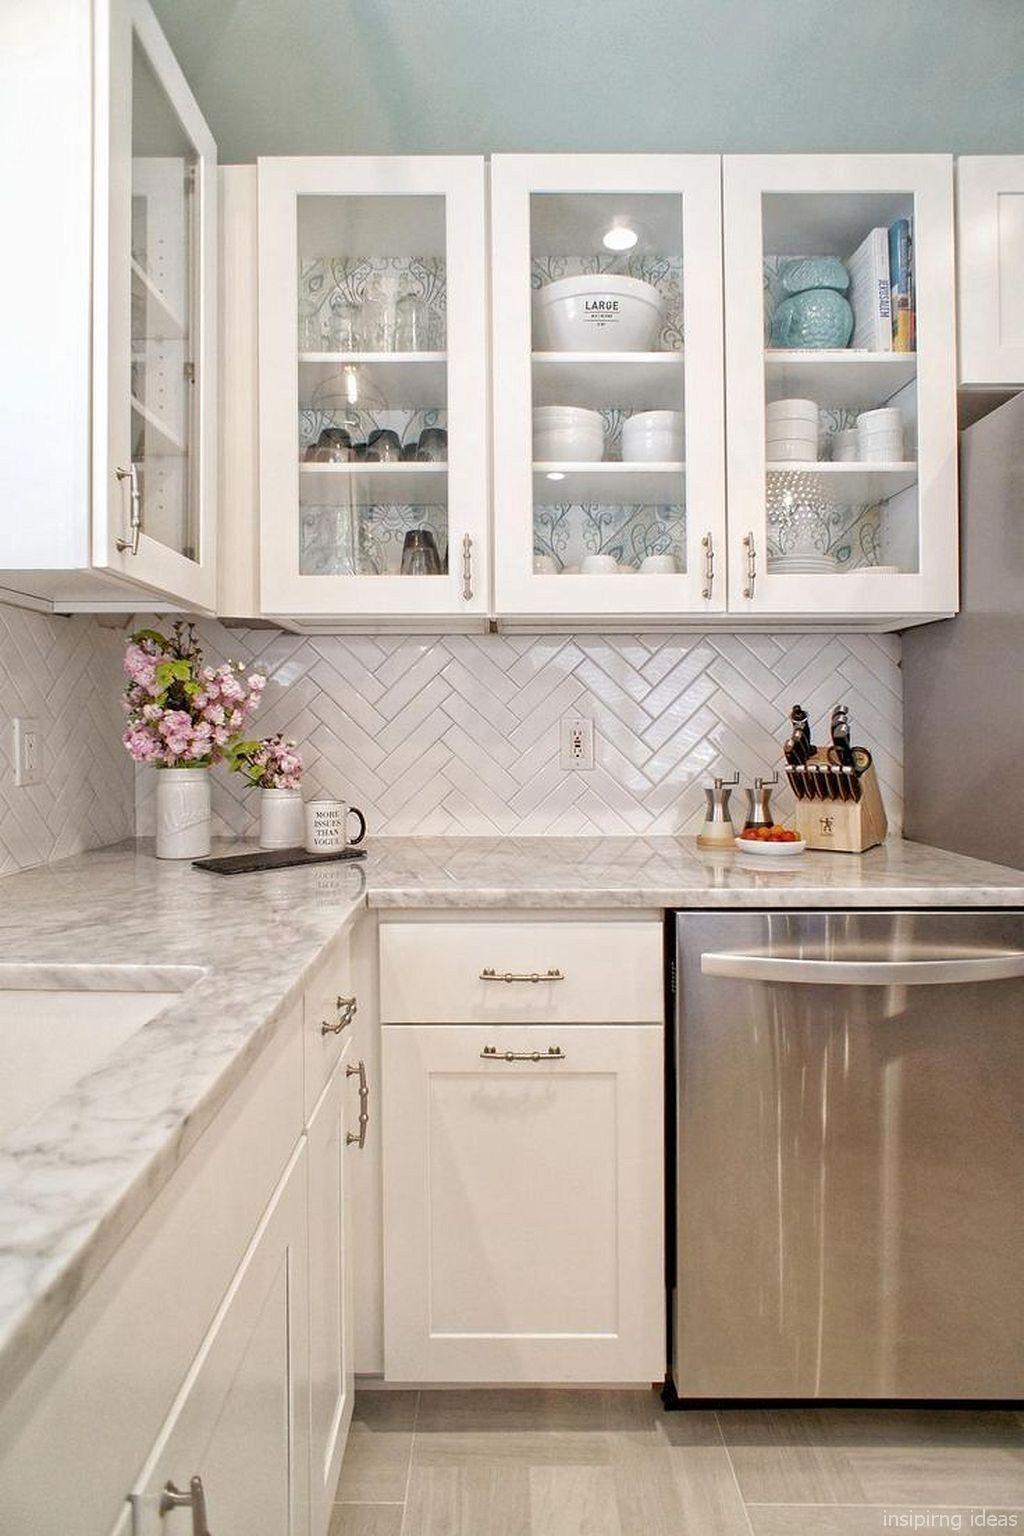 beautiful modern farmhouse kitchen backsplash ideas 13 on kitchen remodeling ideas and designs lowe s id=43475